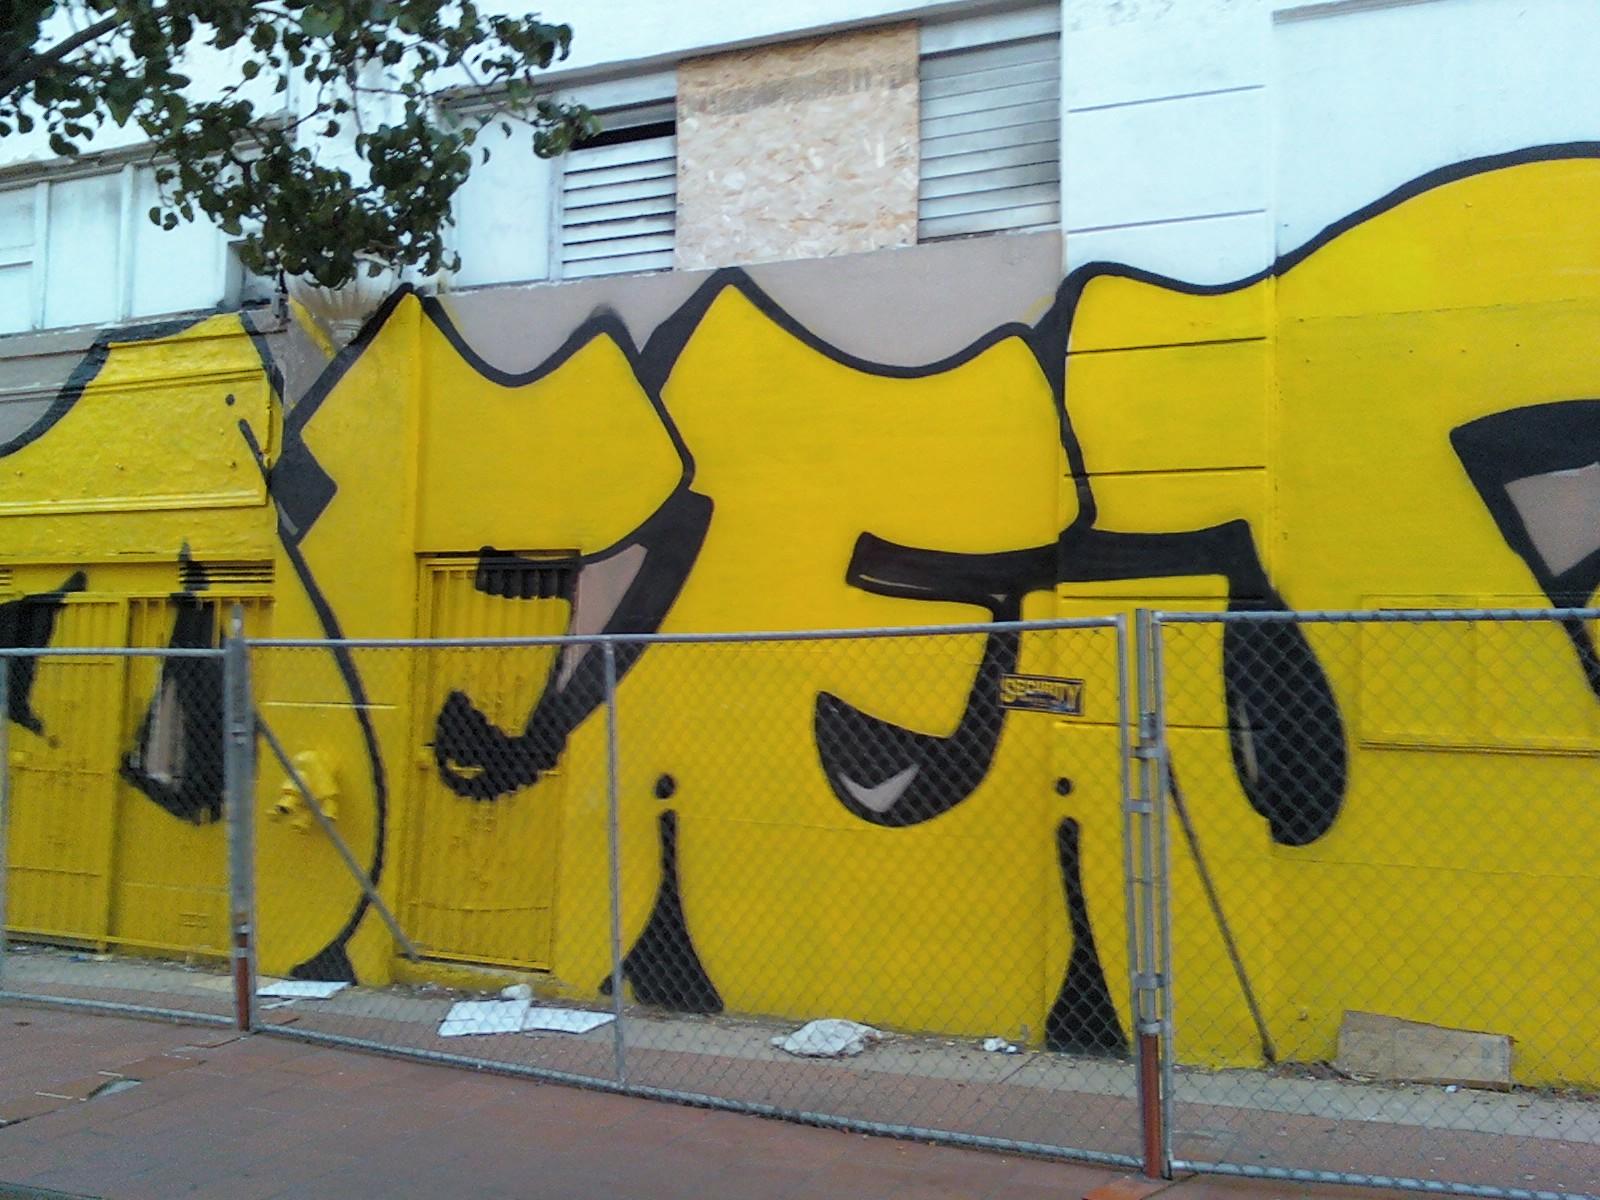 Wallpaper : wall, yellow, sign, graffiti, street art, mural, San ...